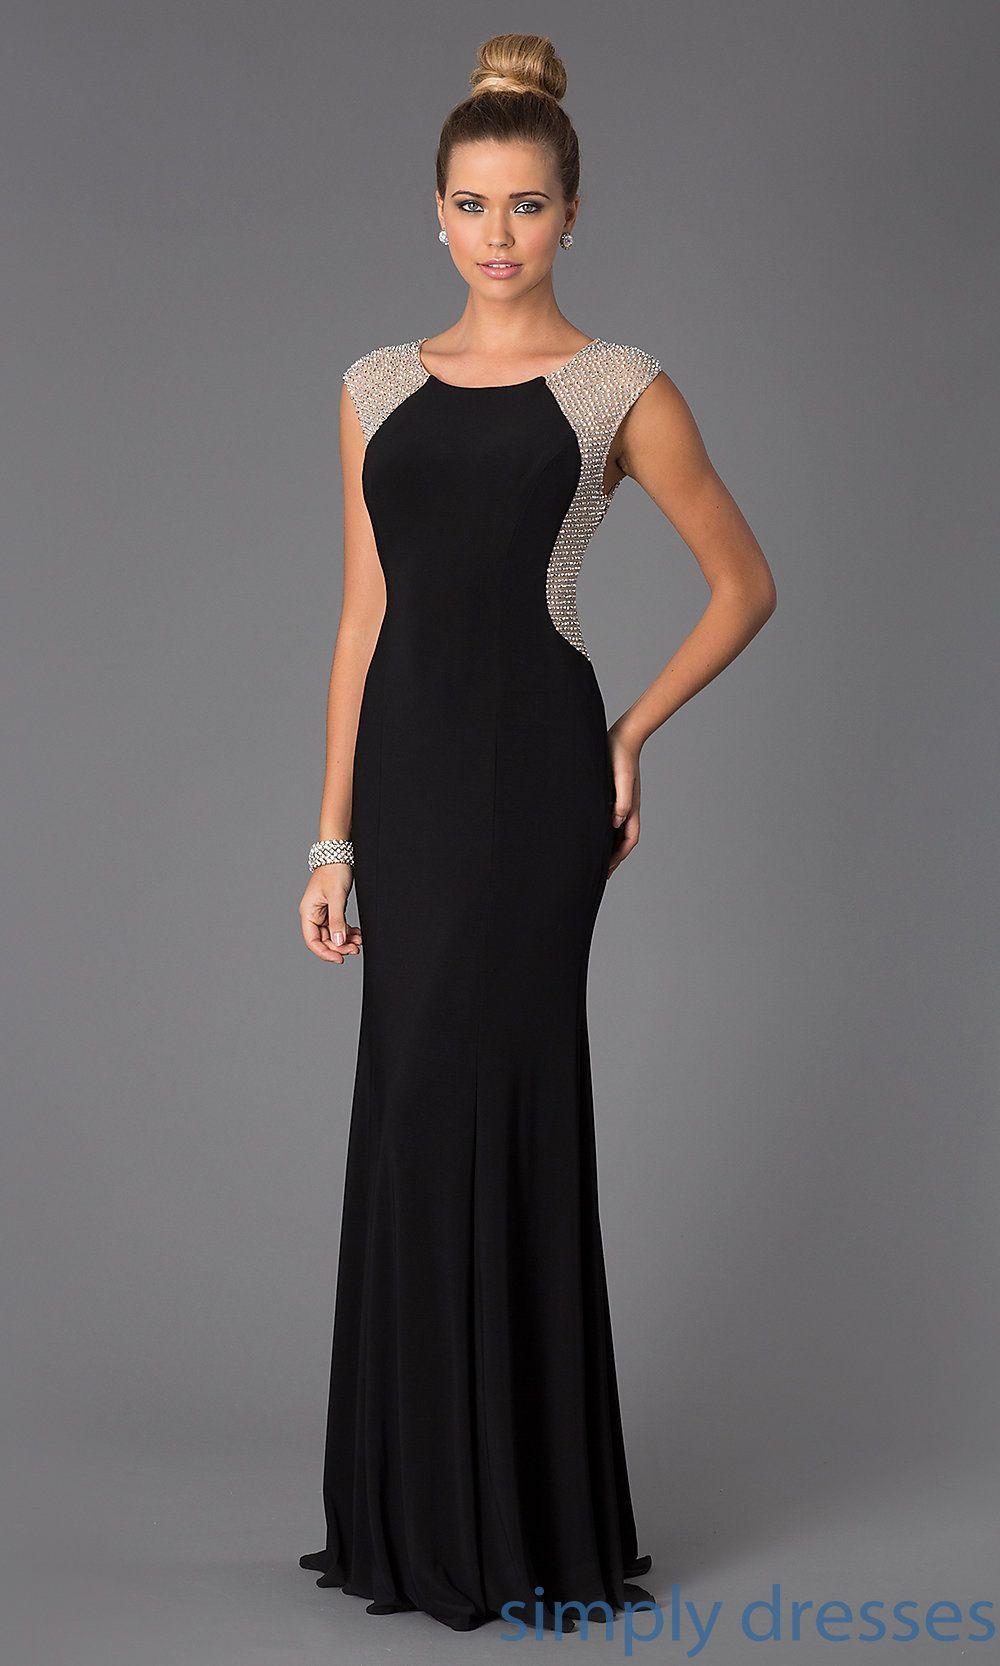 5a92a51a Dresses, Formal, Prom Dresses, Evening Wear: Floor Length Sleeveless Dress  #formaldresses